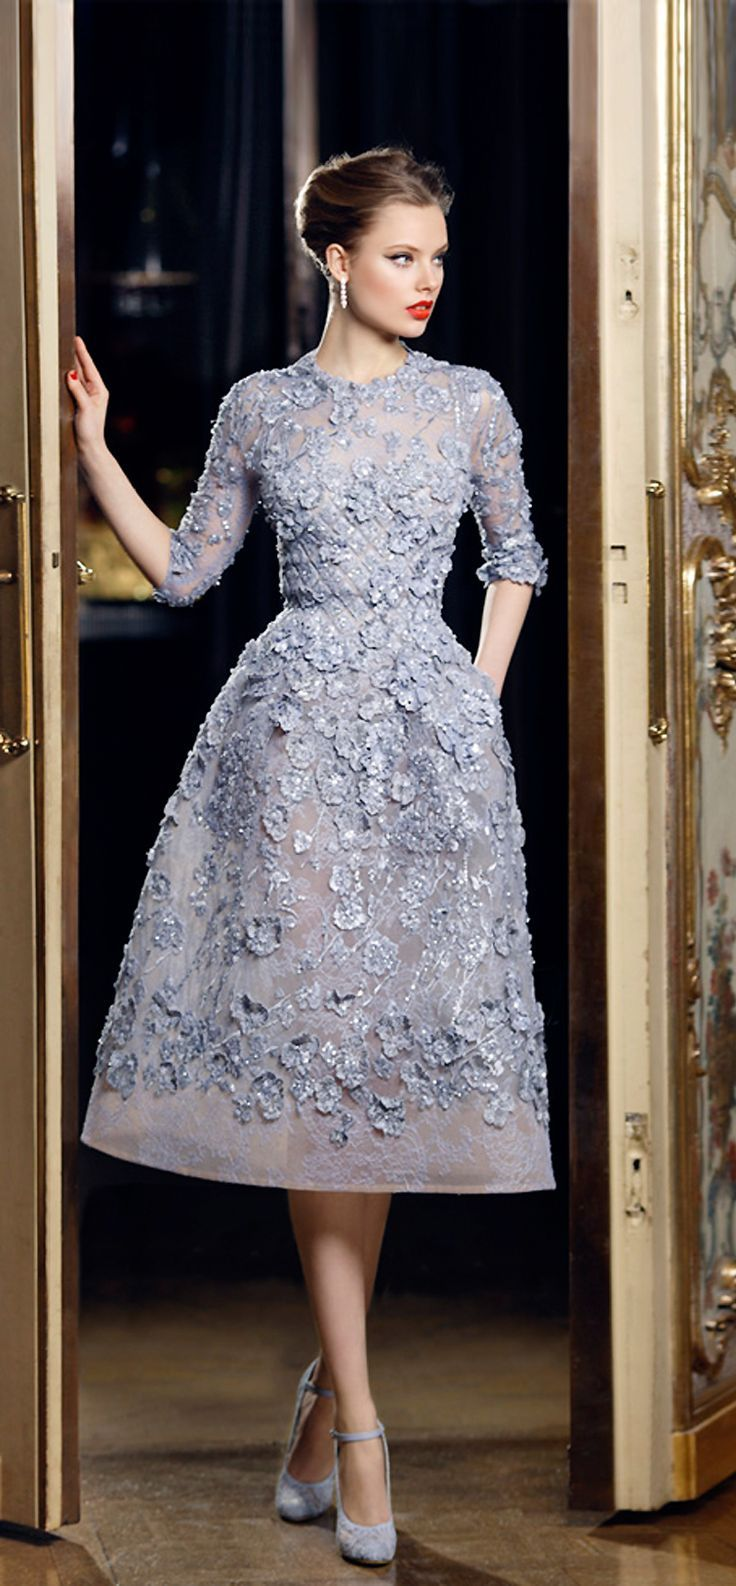 Lindo uc vestidos matri tarde pinterest periwinkle blue dress